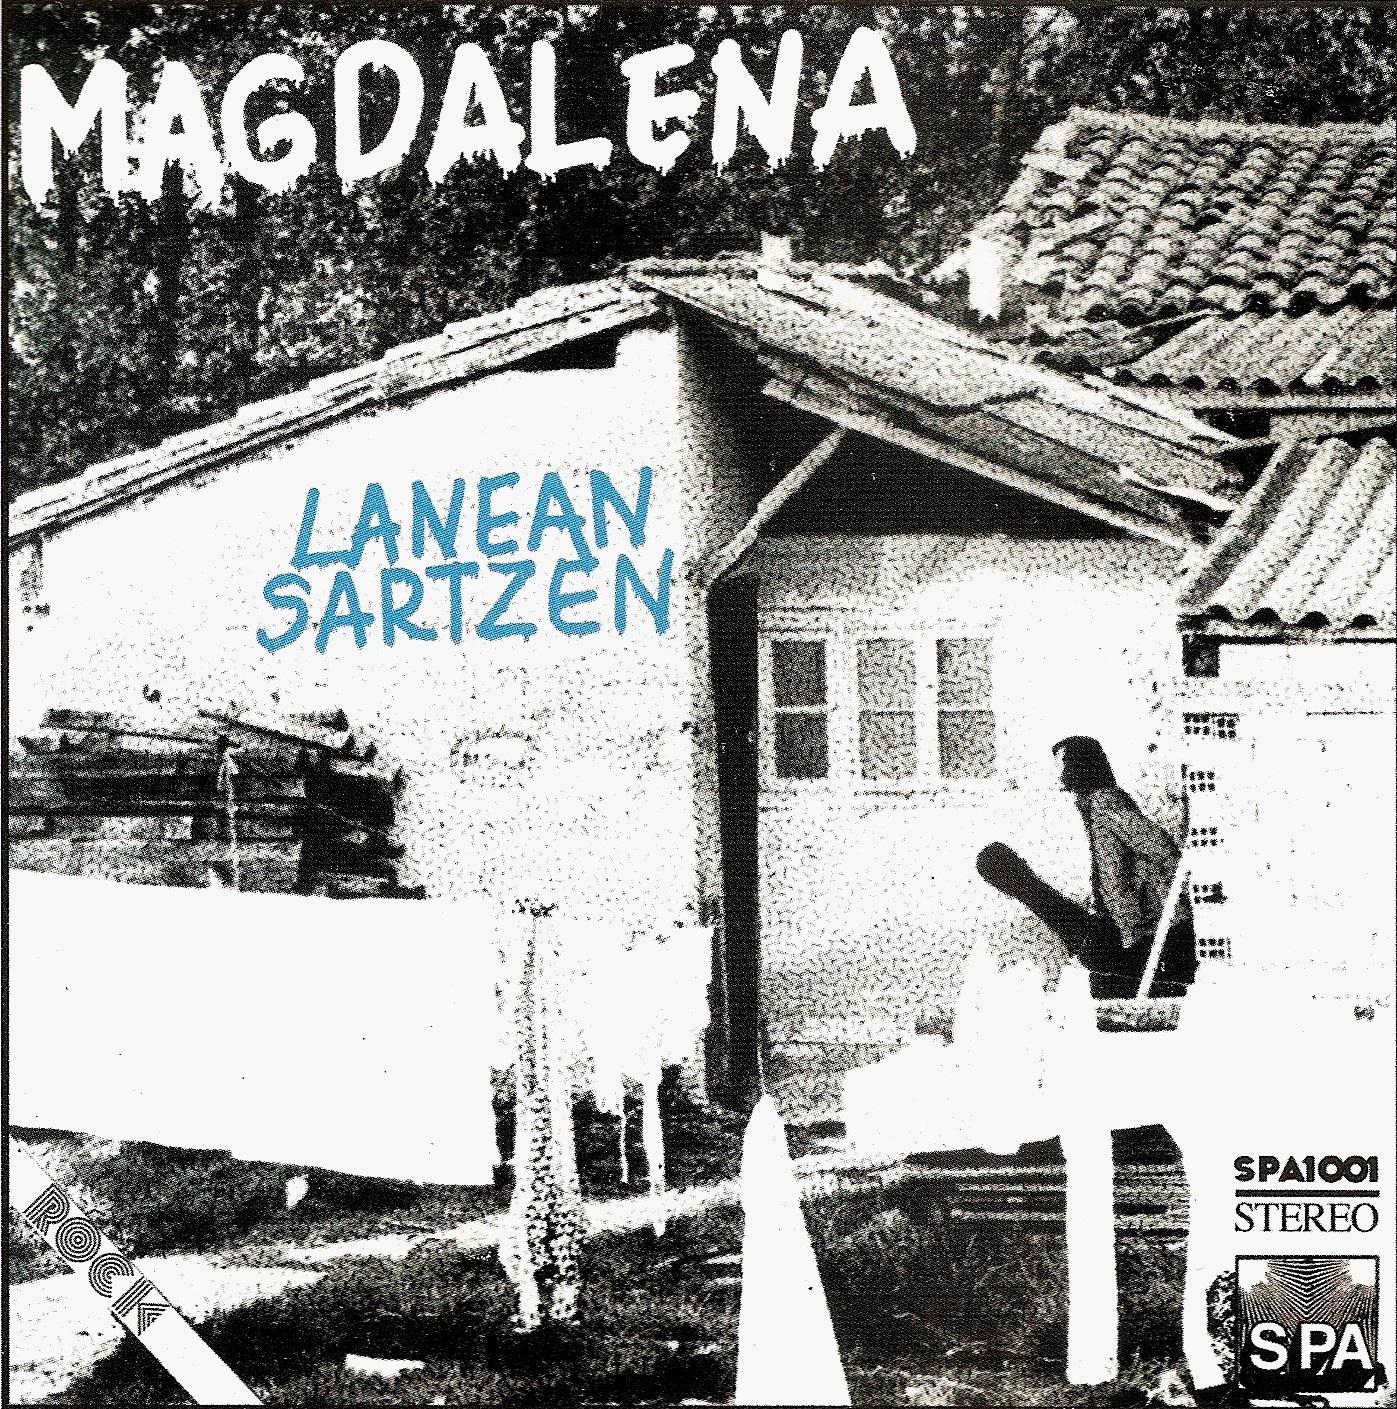 Magdalena Lanean Sartzen